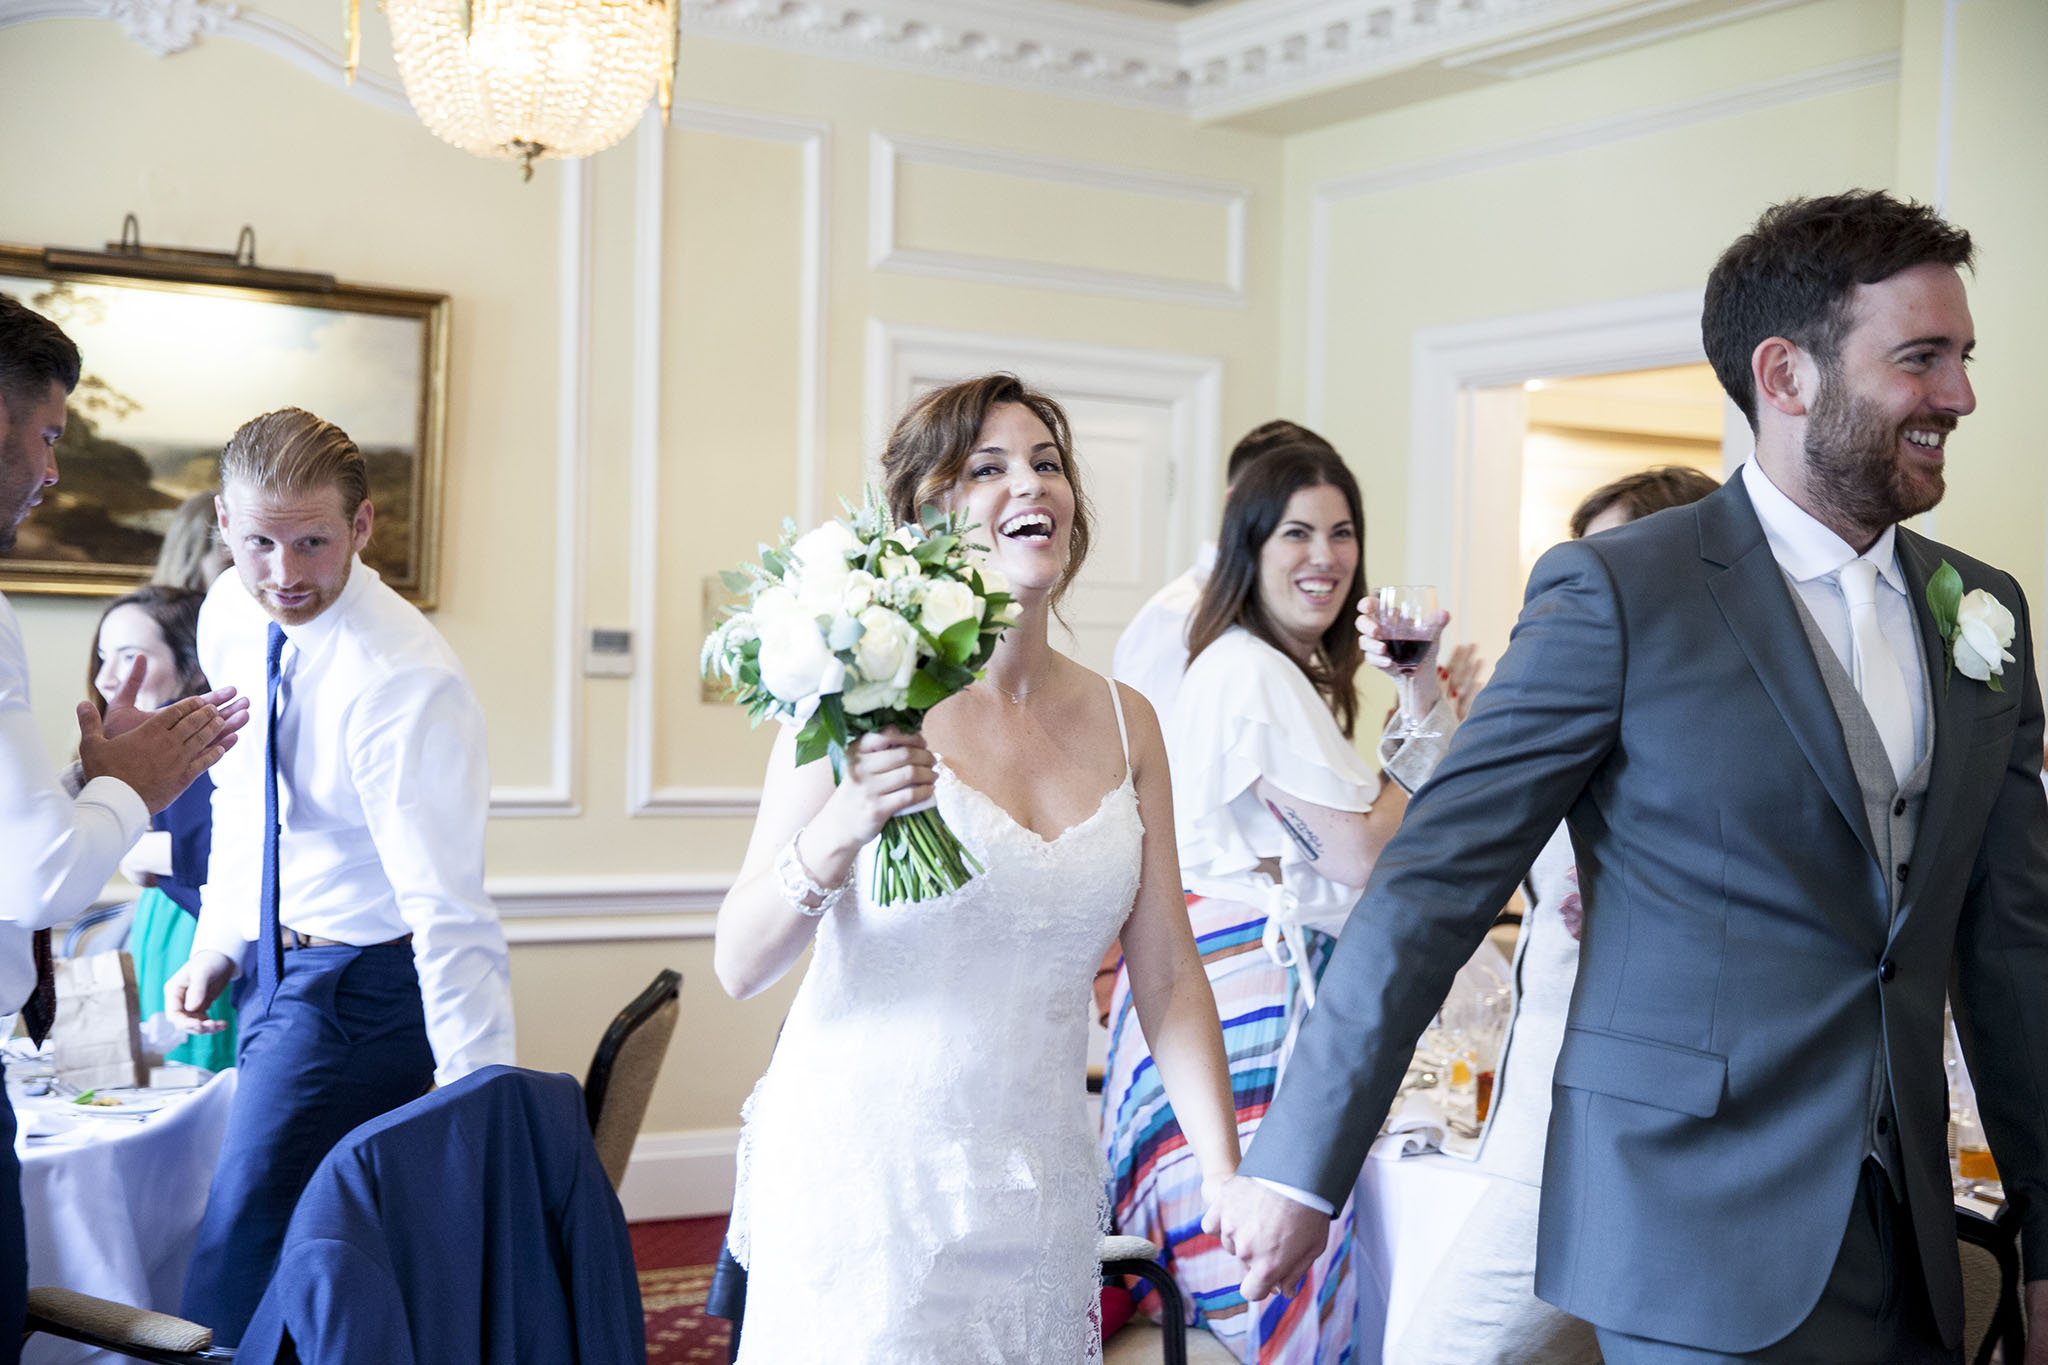 elizabethgphotography_kingslangley_hertfordshire_fineart_wedding_enfield_ricky_nicole_nahlis_22.jpg